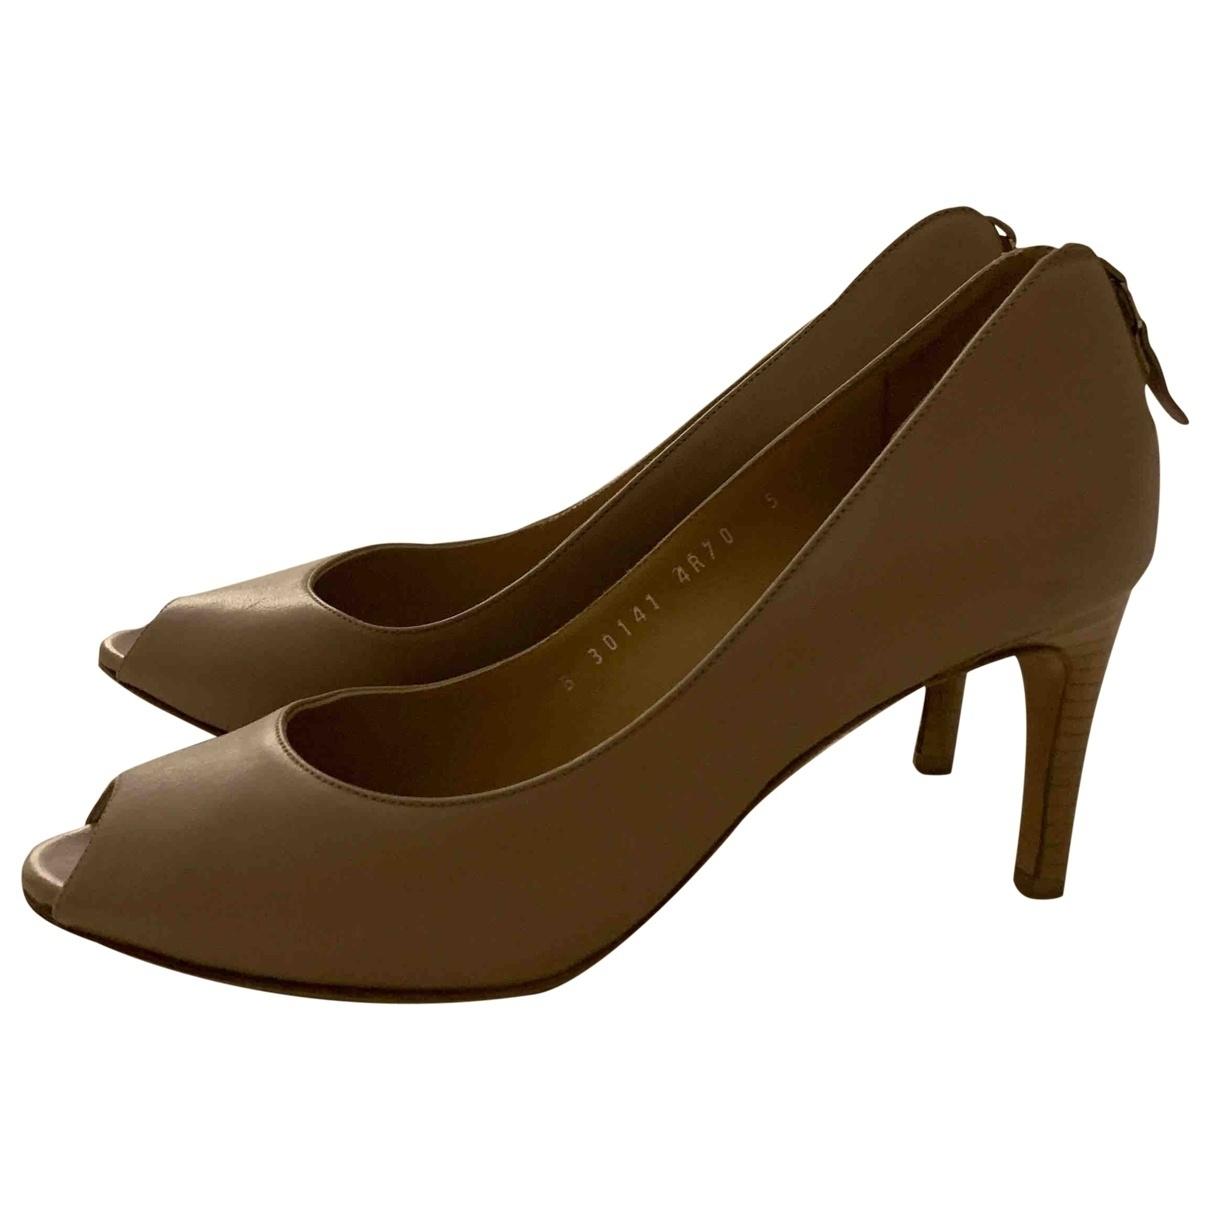 Salvatore Ferragamo \N Beige Leather Heels for Women 35 IT